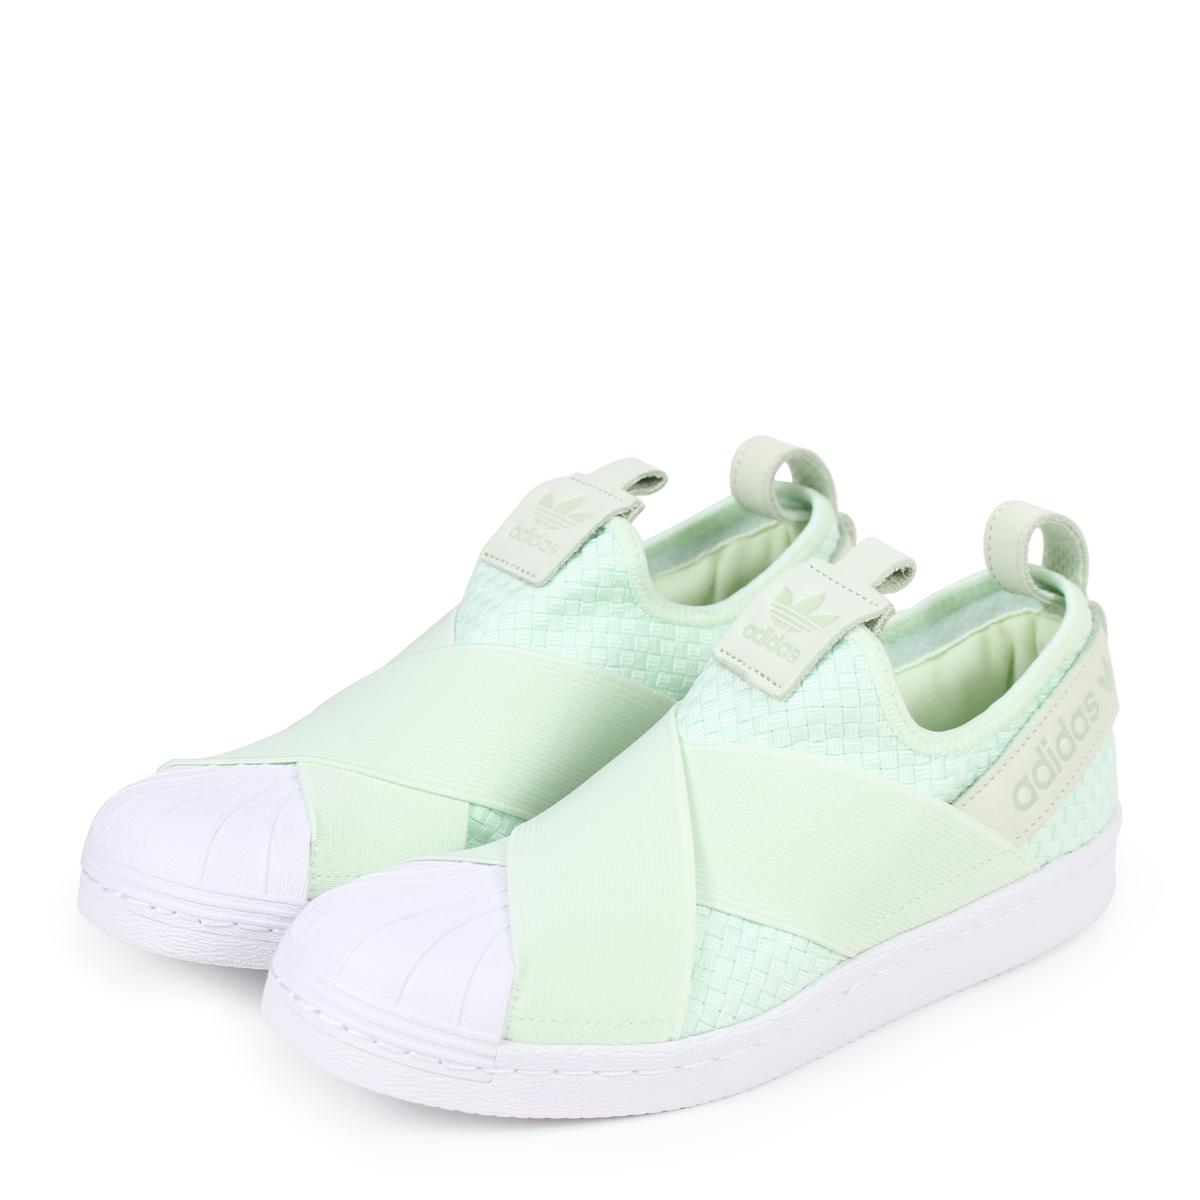 huge selection of 5aa14 93bad adidas Originals SS SLIPON Adidas originals superstar Lady s slip-ons  sneakers Q2488 green  184